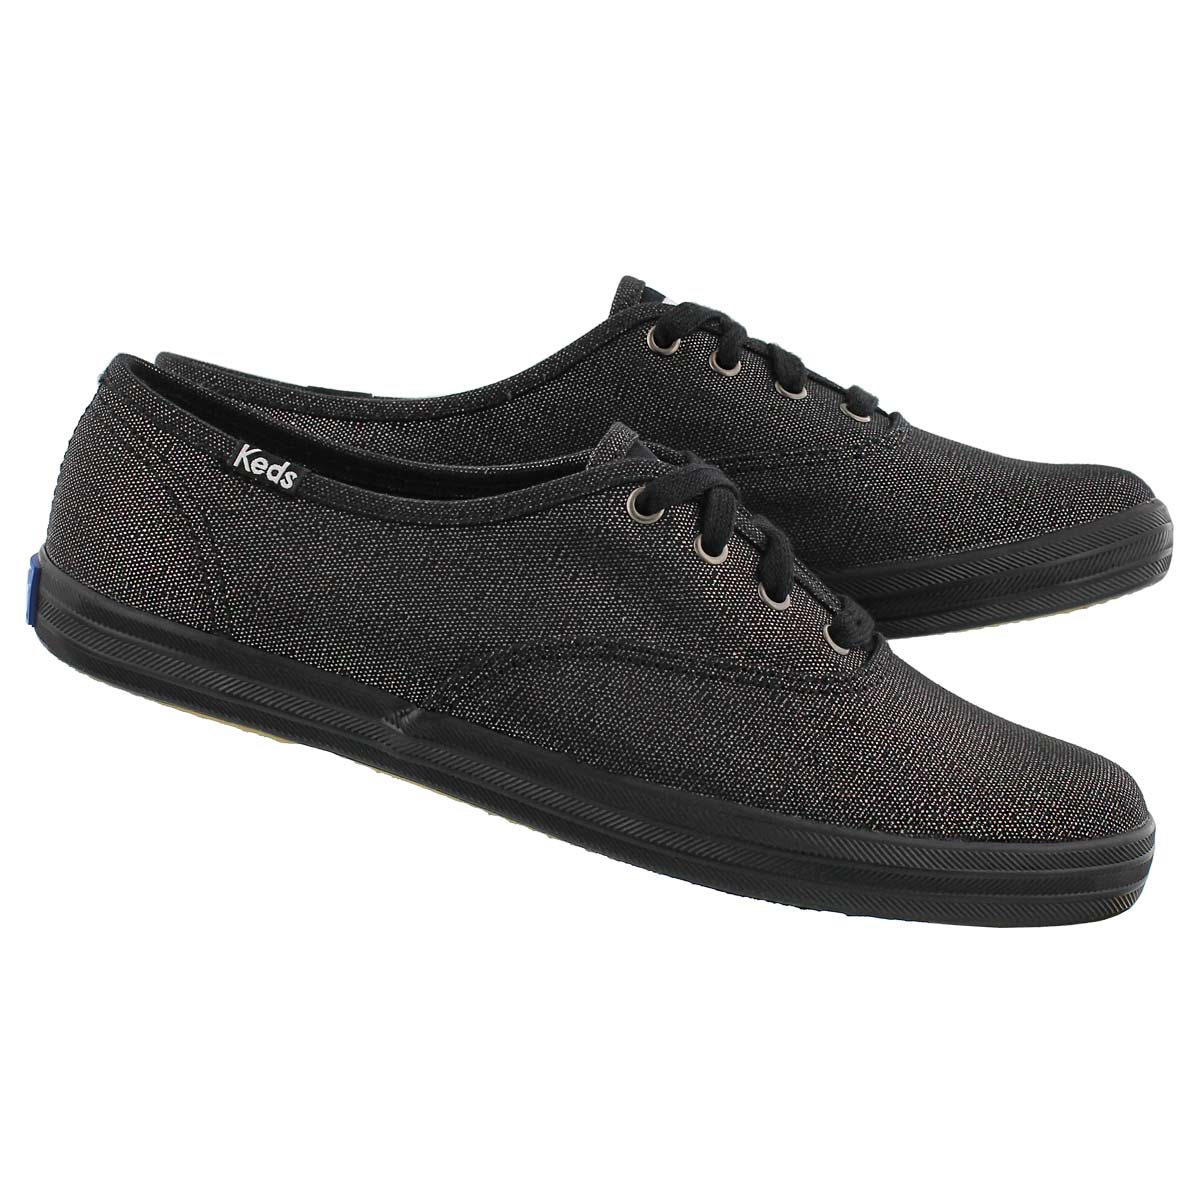 Lds Champion blk/blk metallic sneaker